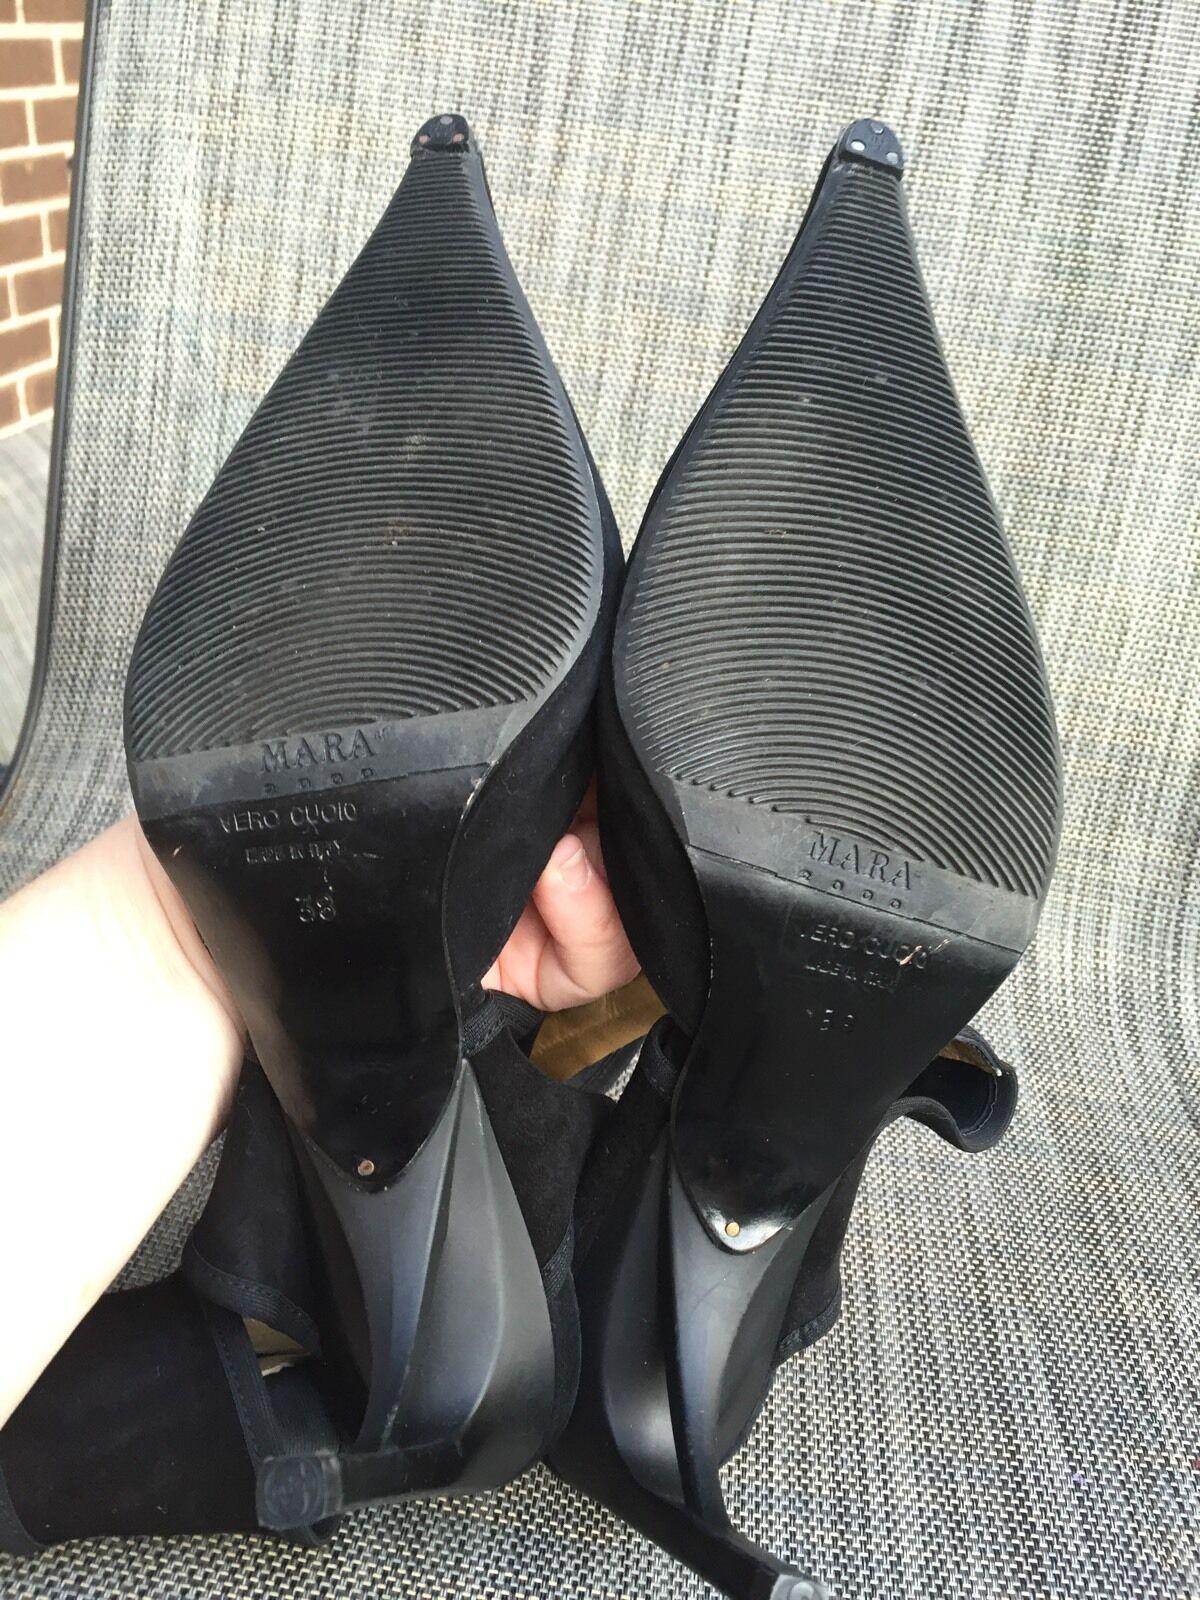 EUC MARA damen schwarz suede suede suede ankle zipped,pumps jeweled,pointed toe schuhe sz.38 85a95b